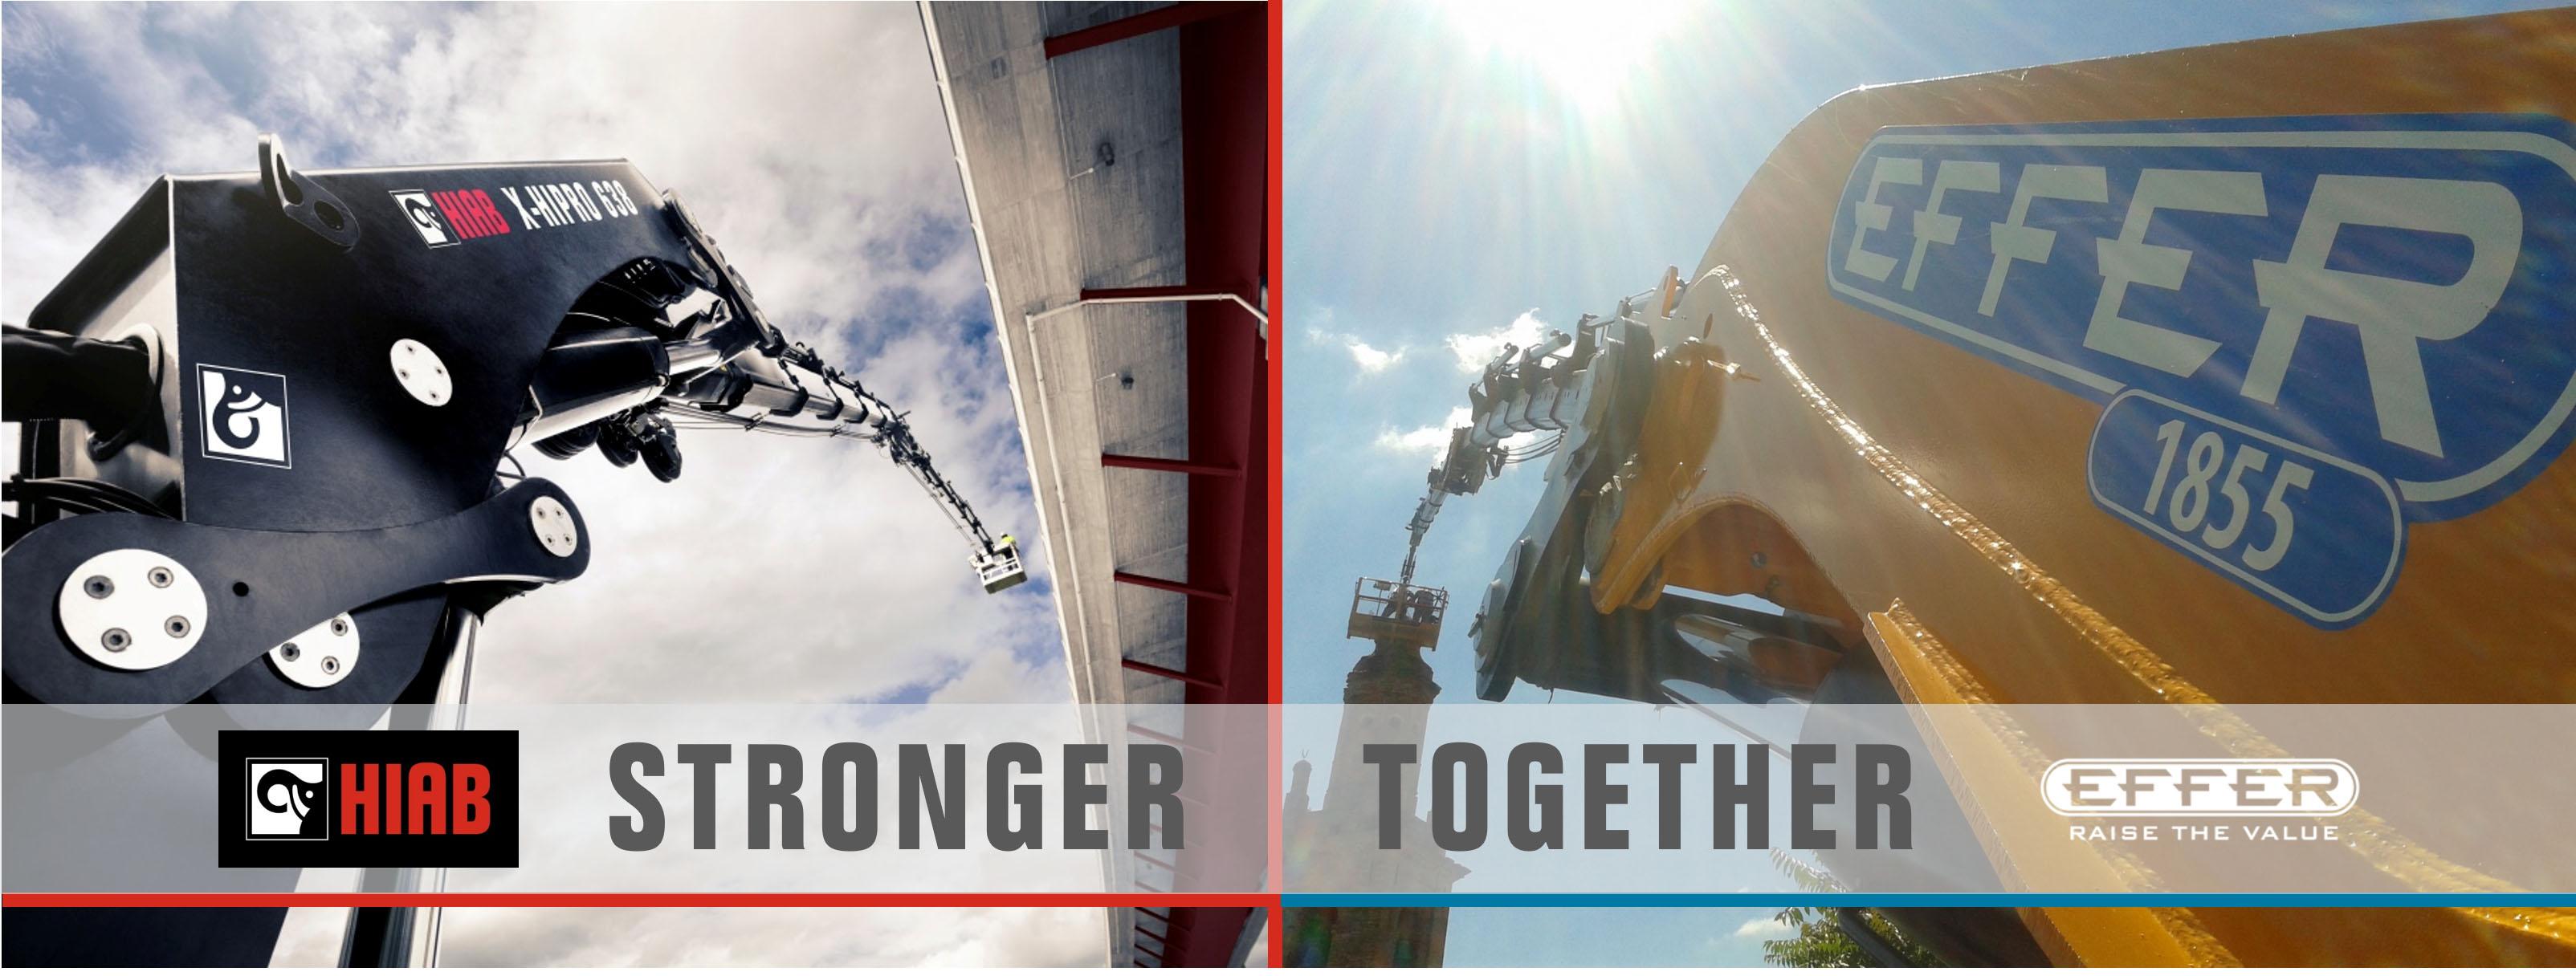 Hiab+Effer_Stronger Together_Signature